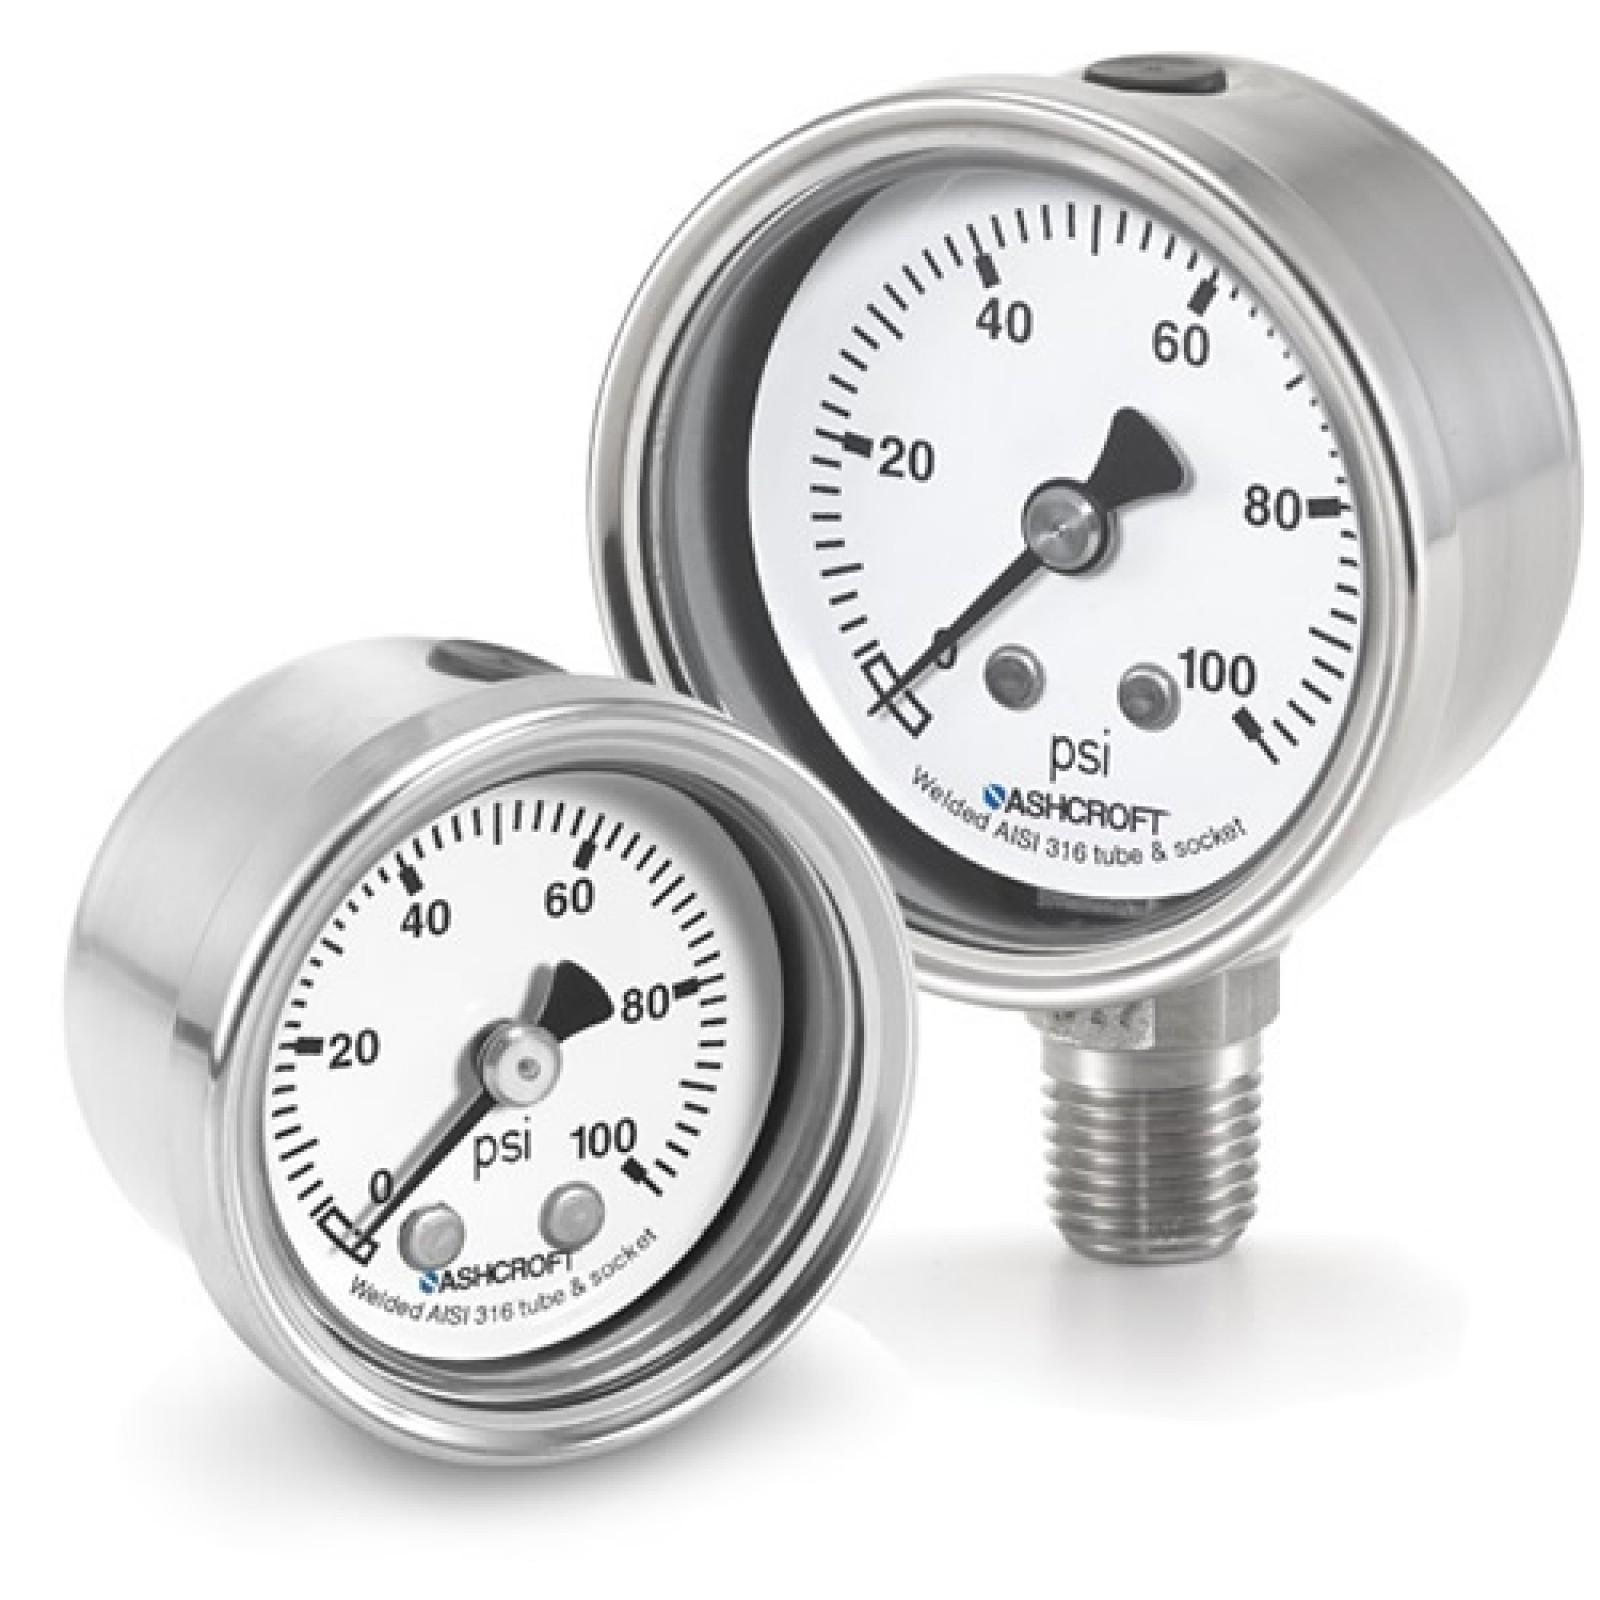 "63 1008S 02L XLL 100#/KP - Pressure Gauge, 63mm stainless 1/4"" NPT Lower conn & Case, Plus Performance 0/100 psi"